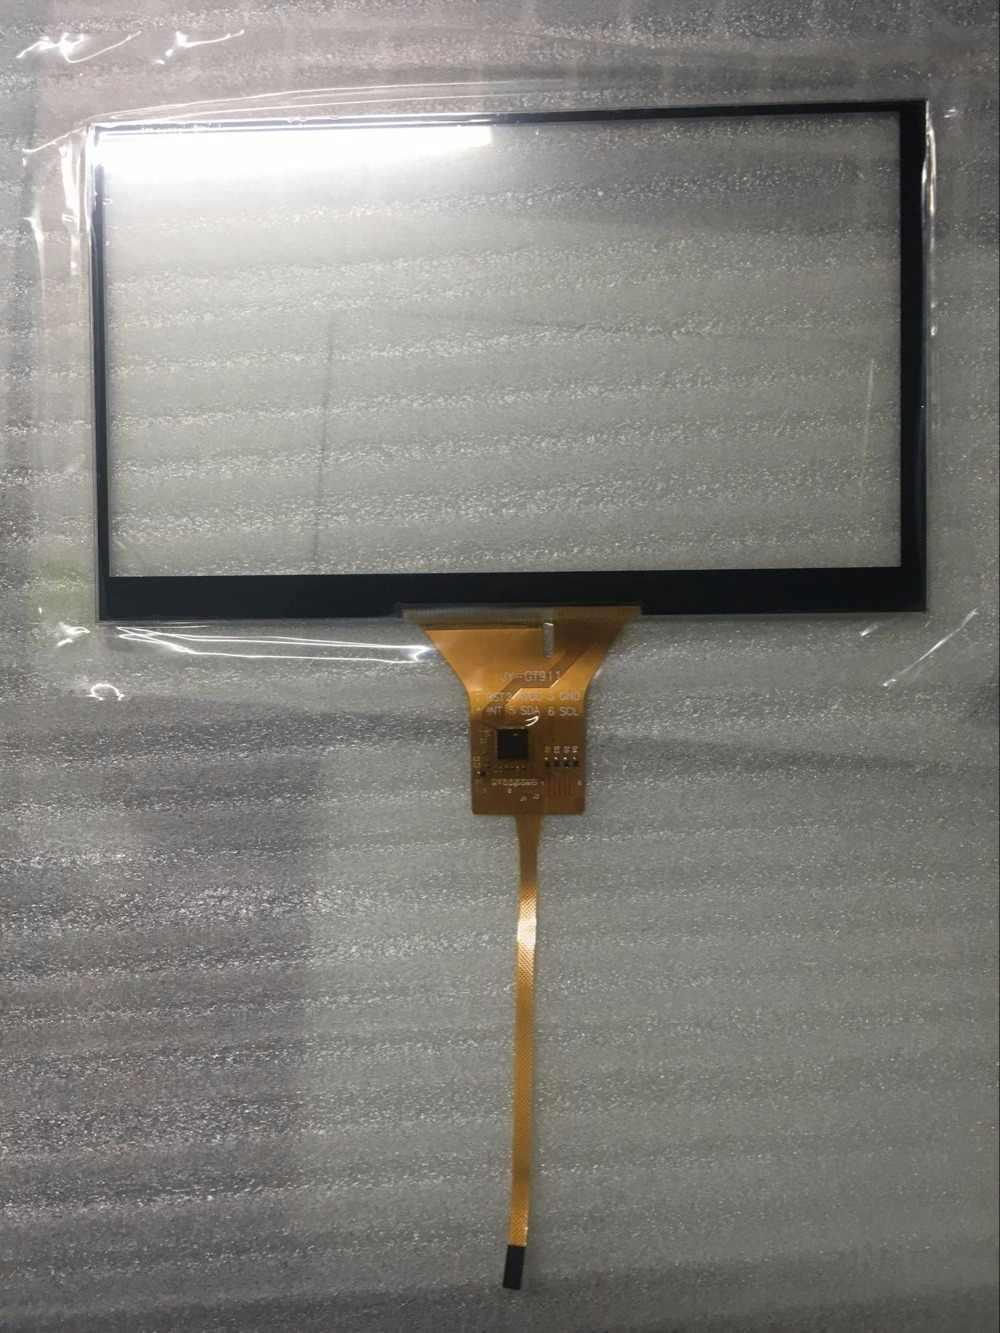 Pantalla táctil capacitiva de 7 pulgadas para la navegación del DVD del coche 164mm * 99mm pantalla táctil universal de 6pin JY-GT911 entrega gratuita.